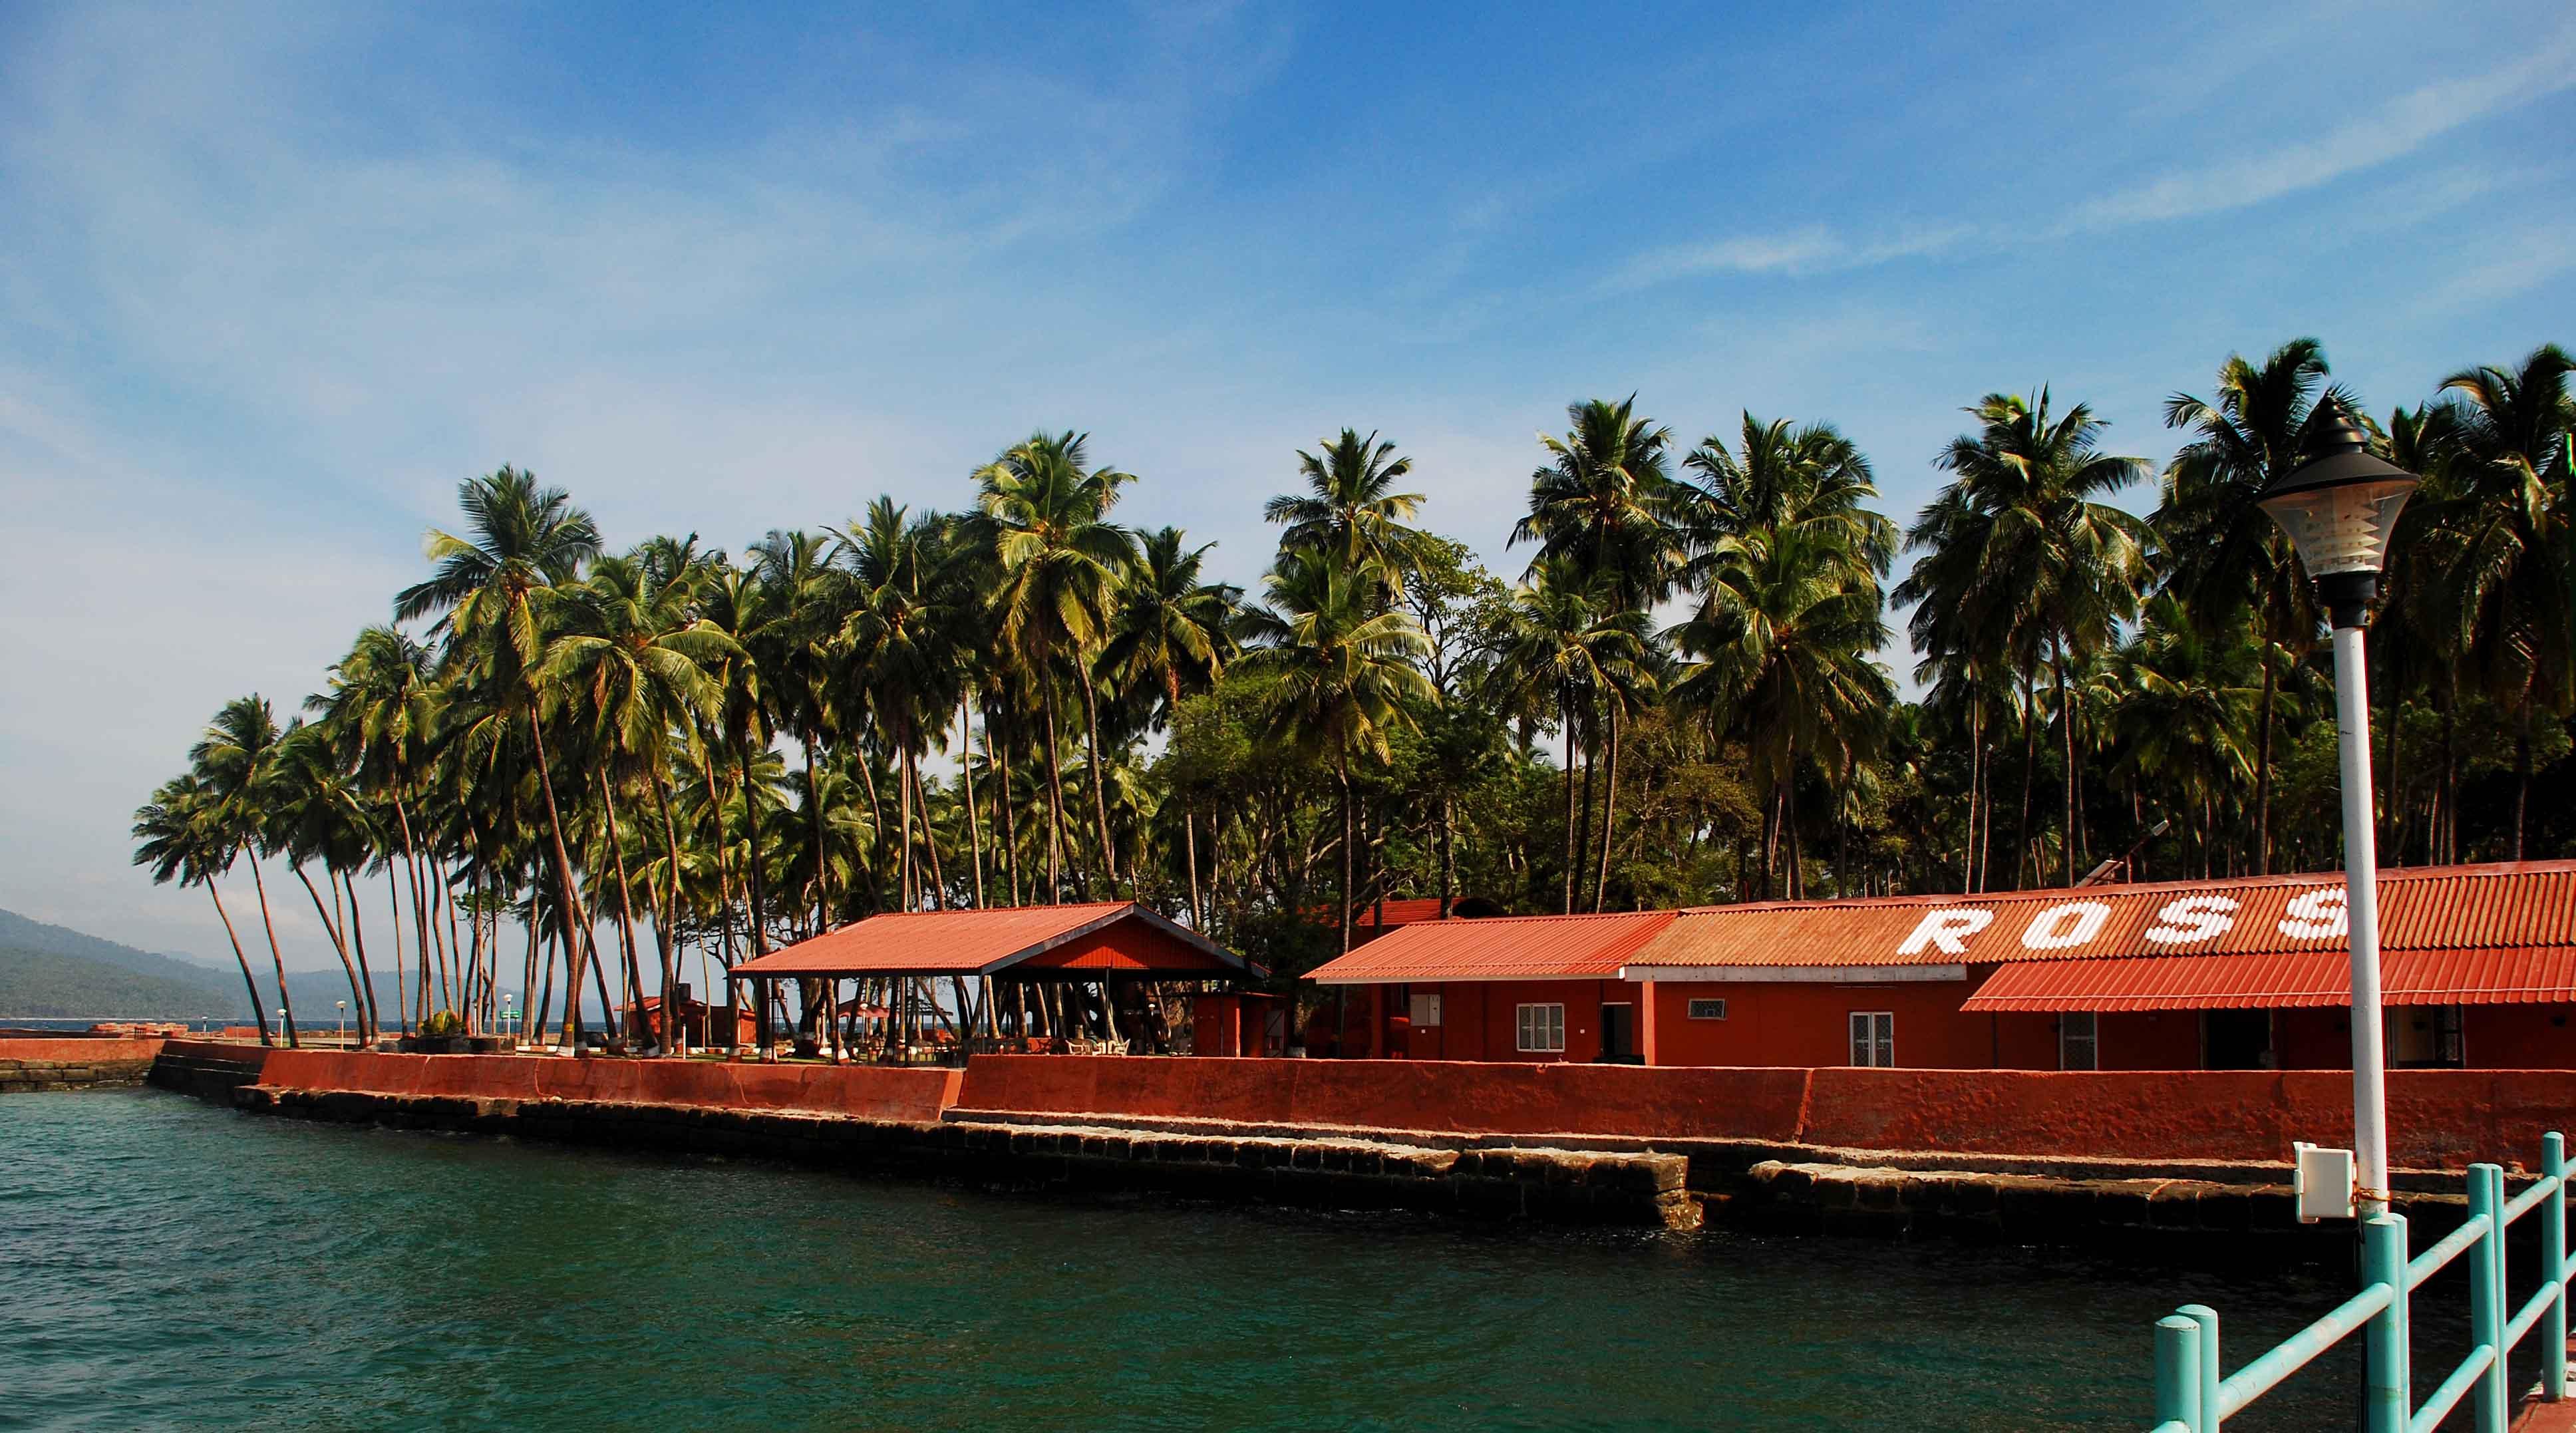 Ross island Andamans